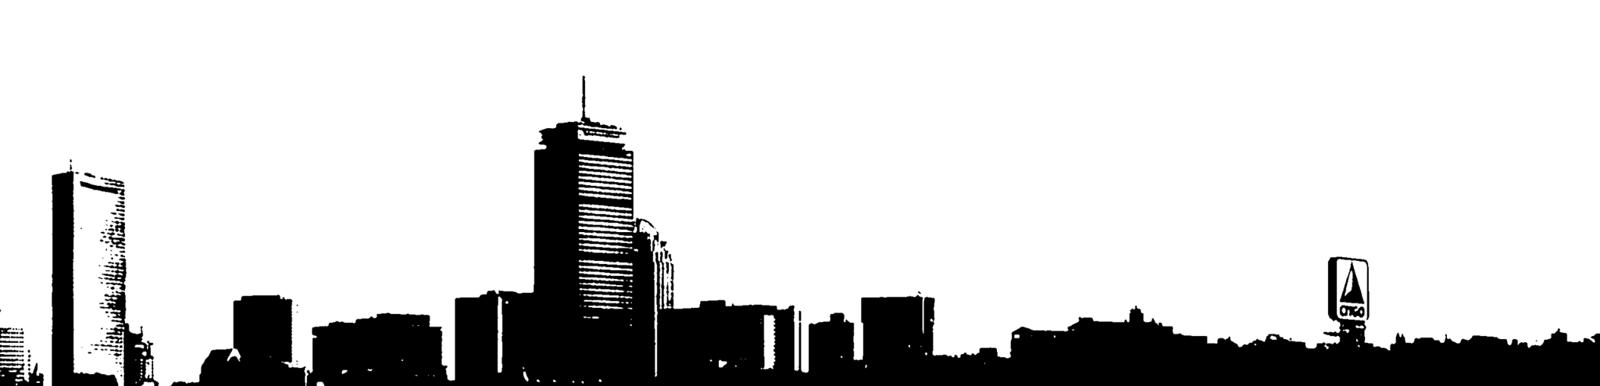 Boston Silhouette